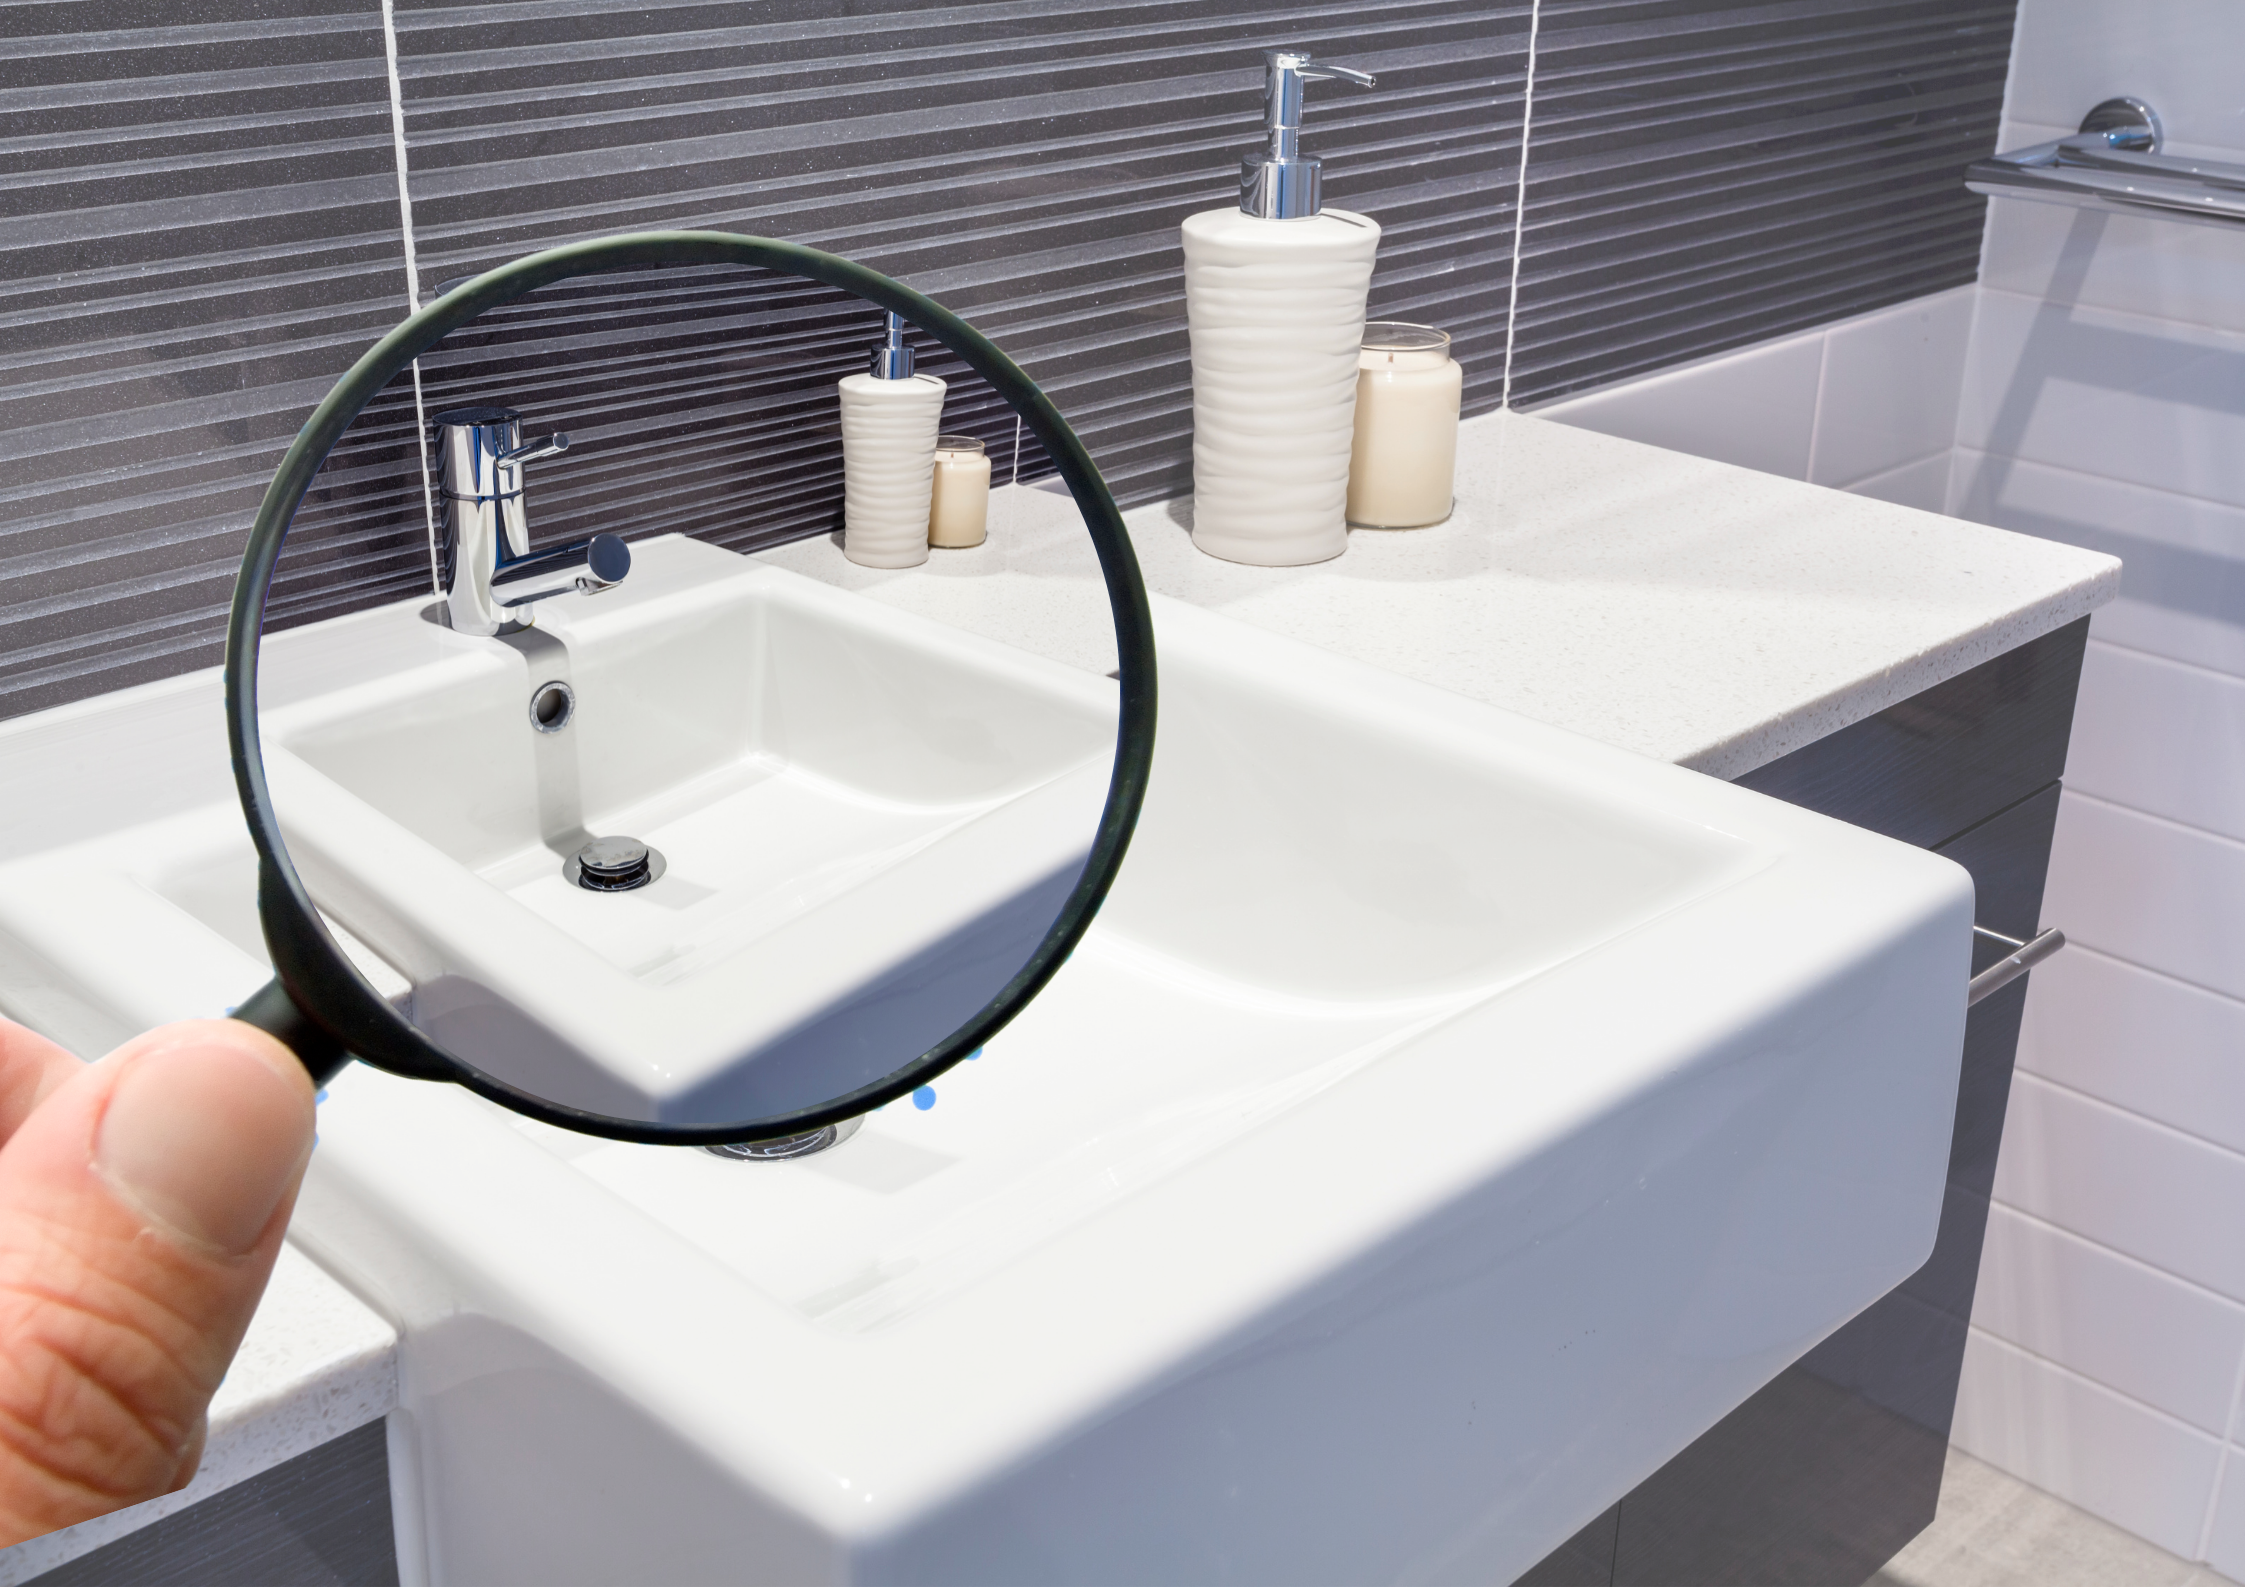 Effective-Ways-to-Verify-the-Originality-of-Your-Bath-Essentials-1